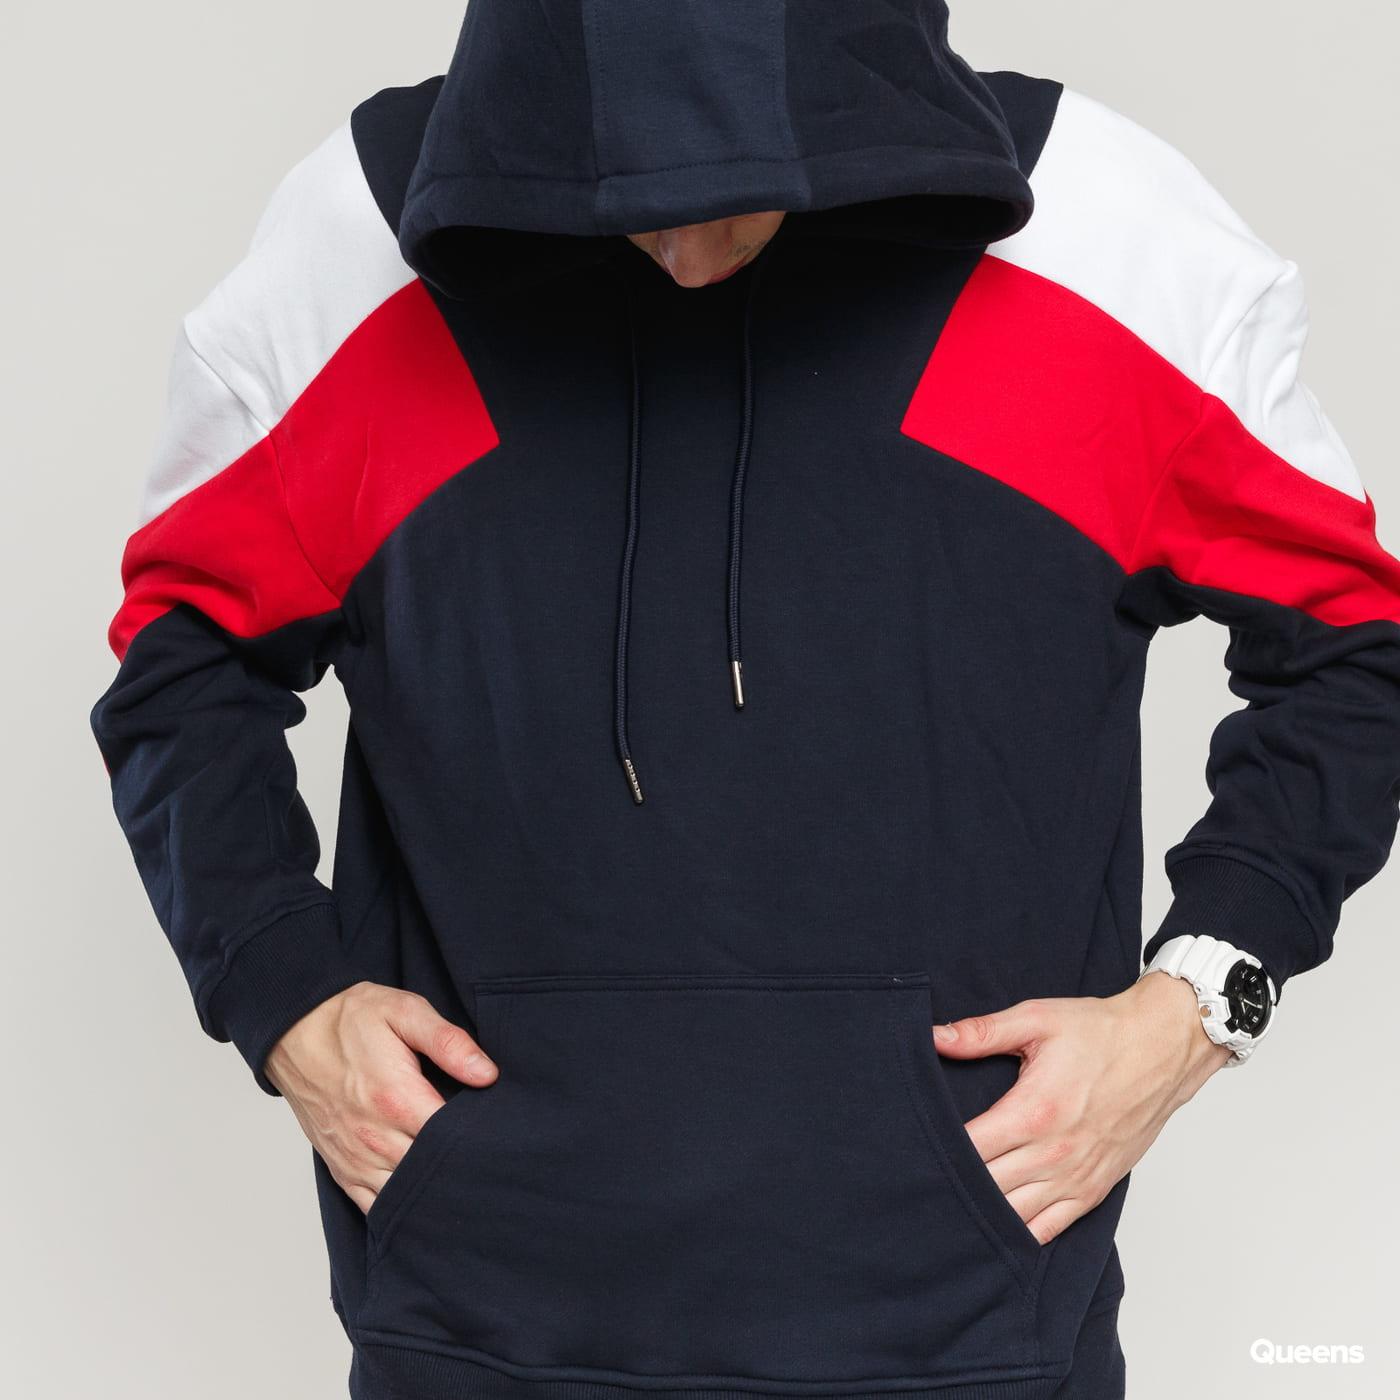 Urban Classics Oversize 3-Tone Hoody navy / red / white